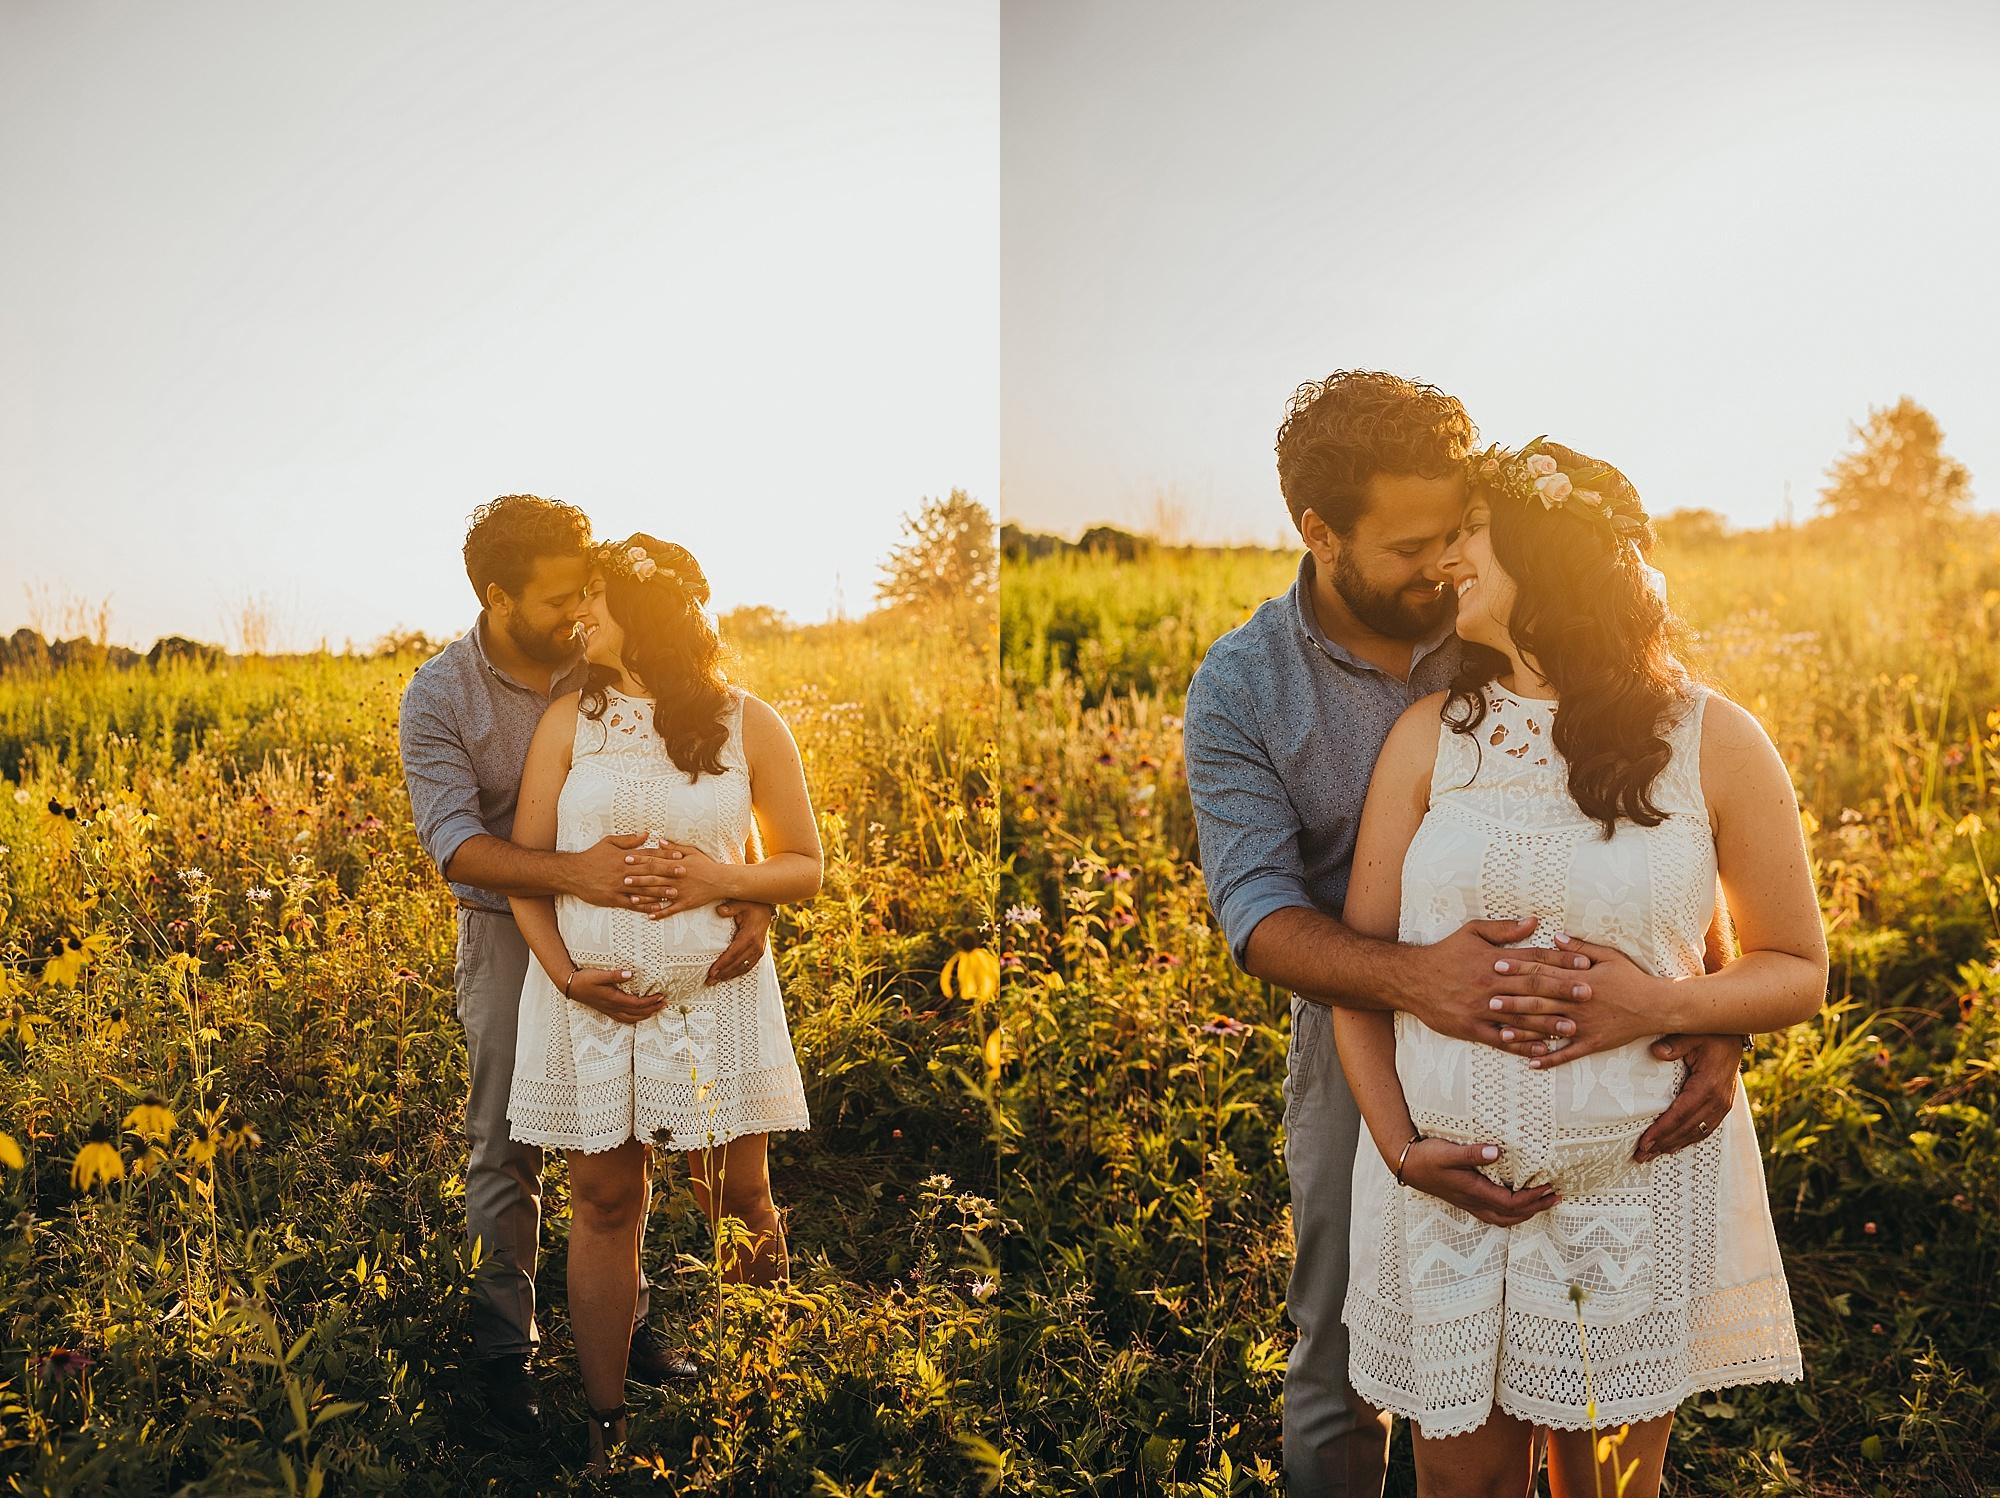 lauren-grayson-photography-cleveland-ohio-photographer-maternity-summer-outdoor-bohemian-fields-session_0487.jpg